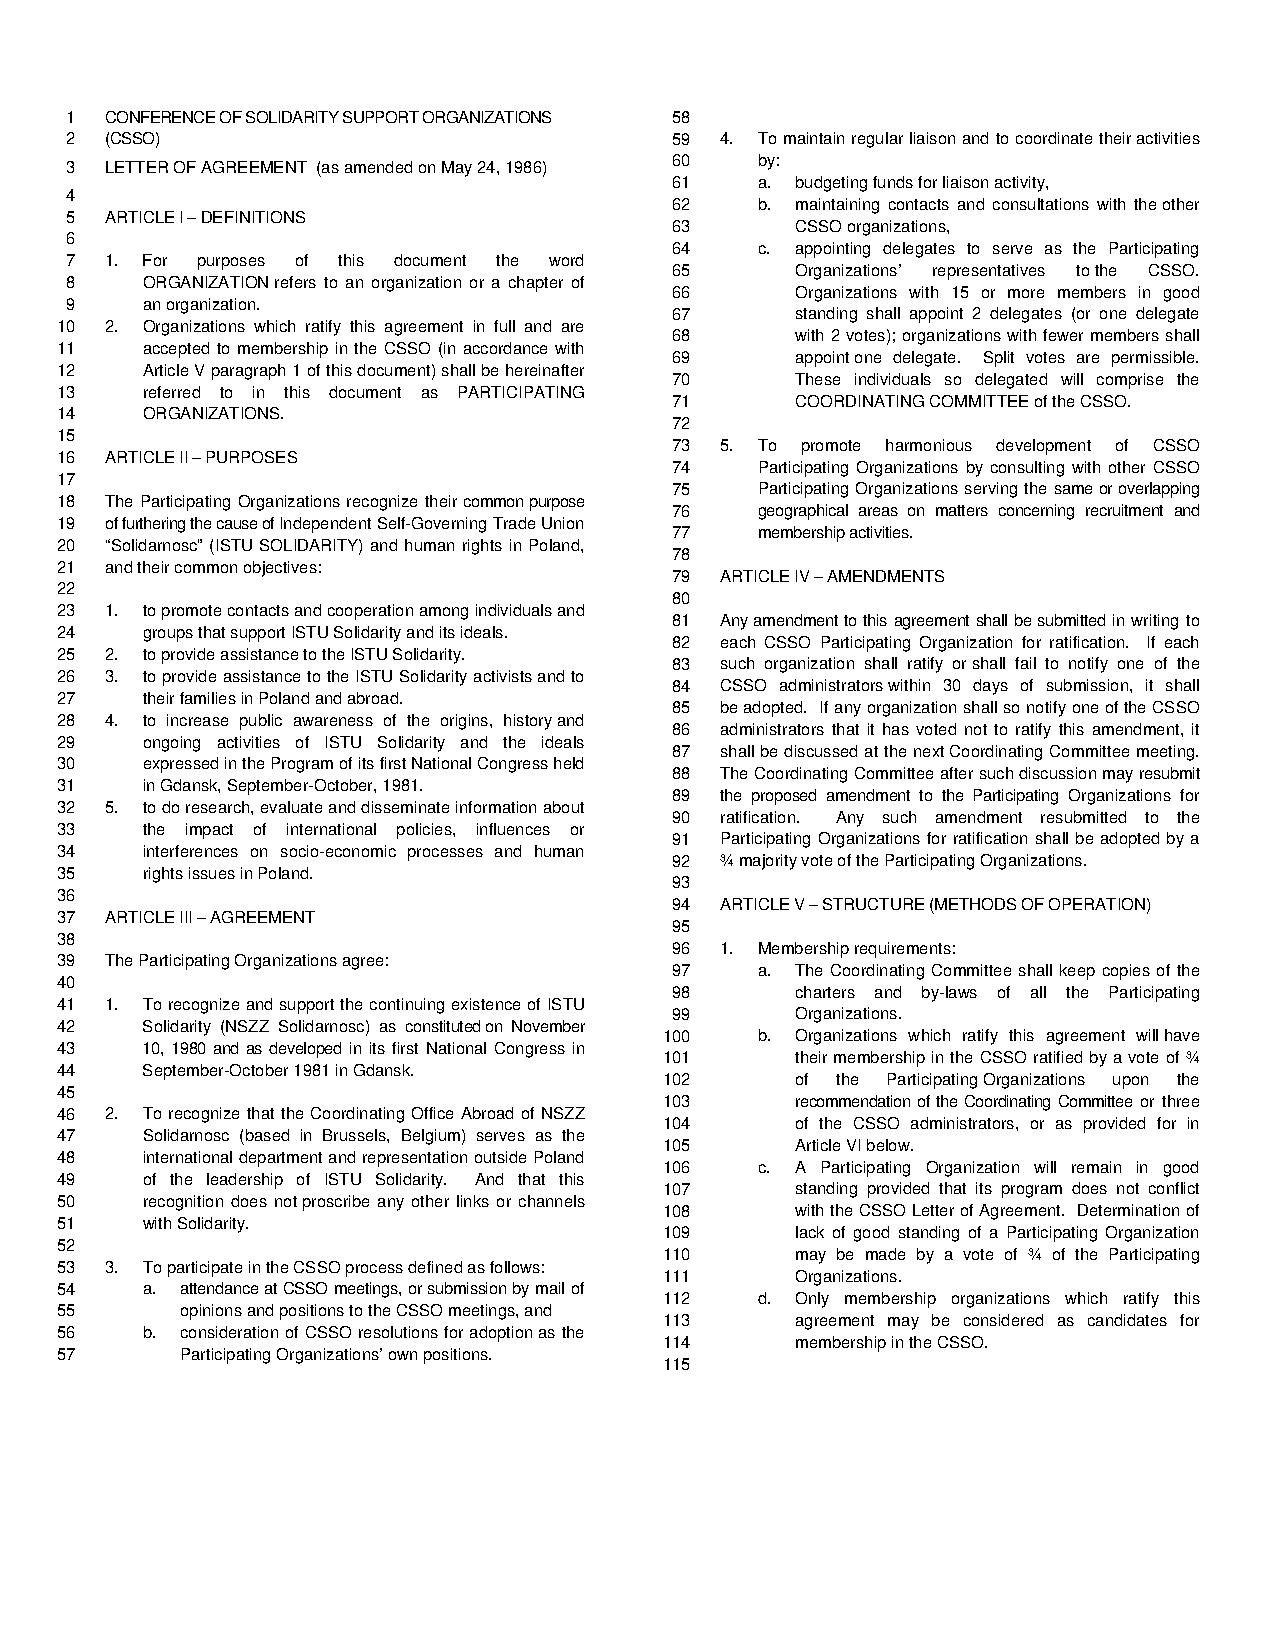 Real Estate Resignation Letter 27.04.2017